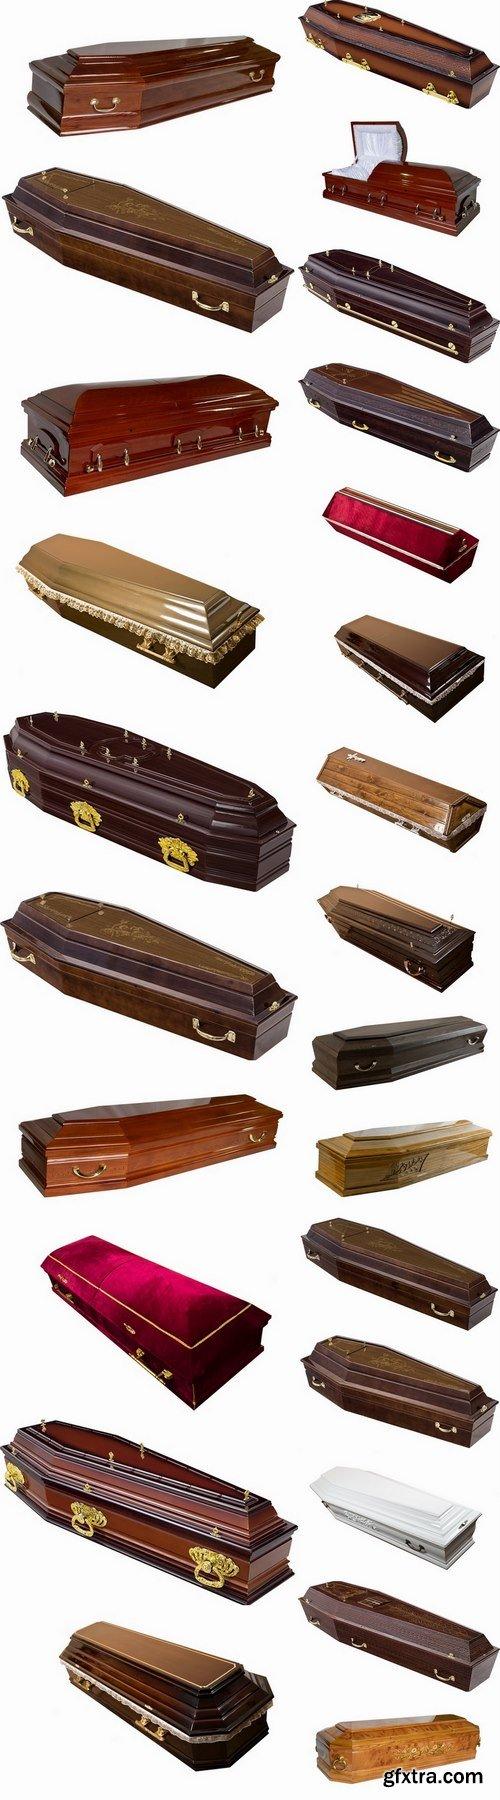 Coffin and precious wood 25 HQ Jpeg